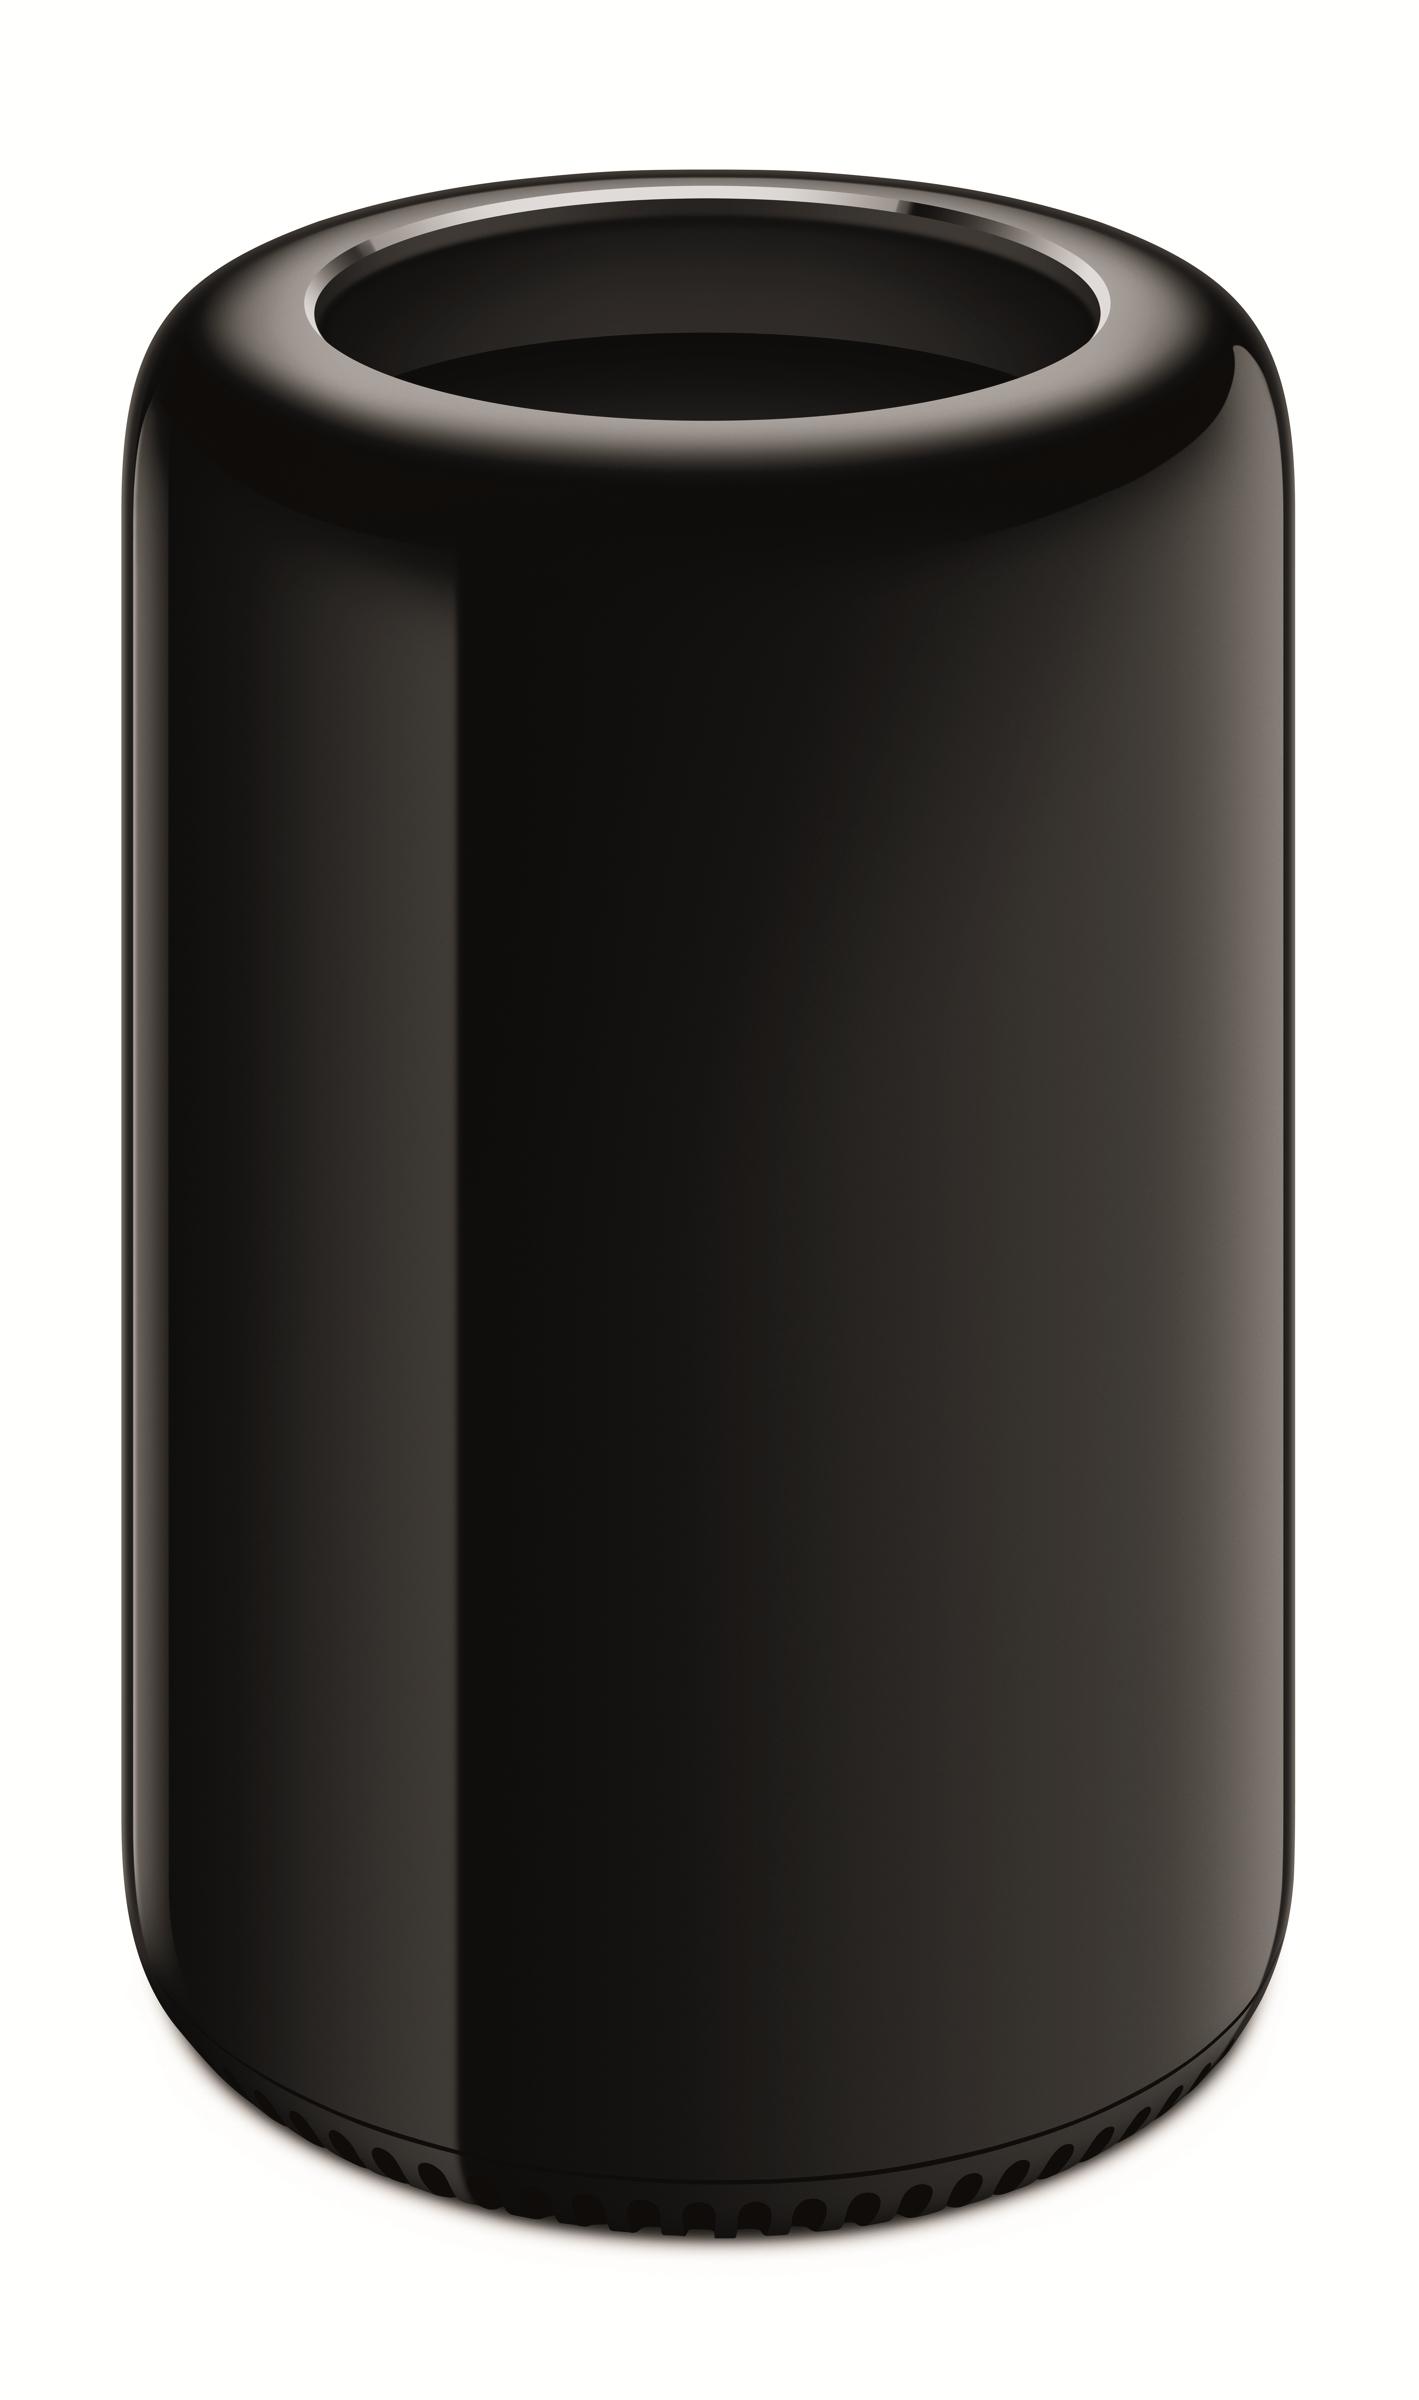 Apple Mac Pro 3.5Ghz 6-Core Intel Xeon E5